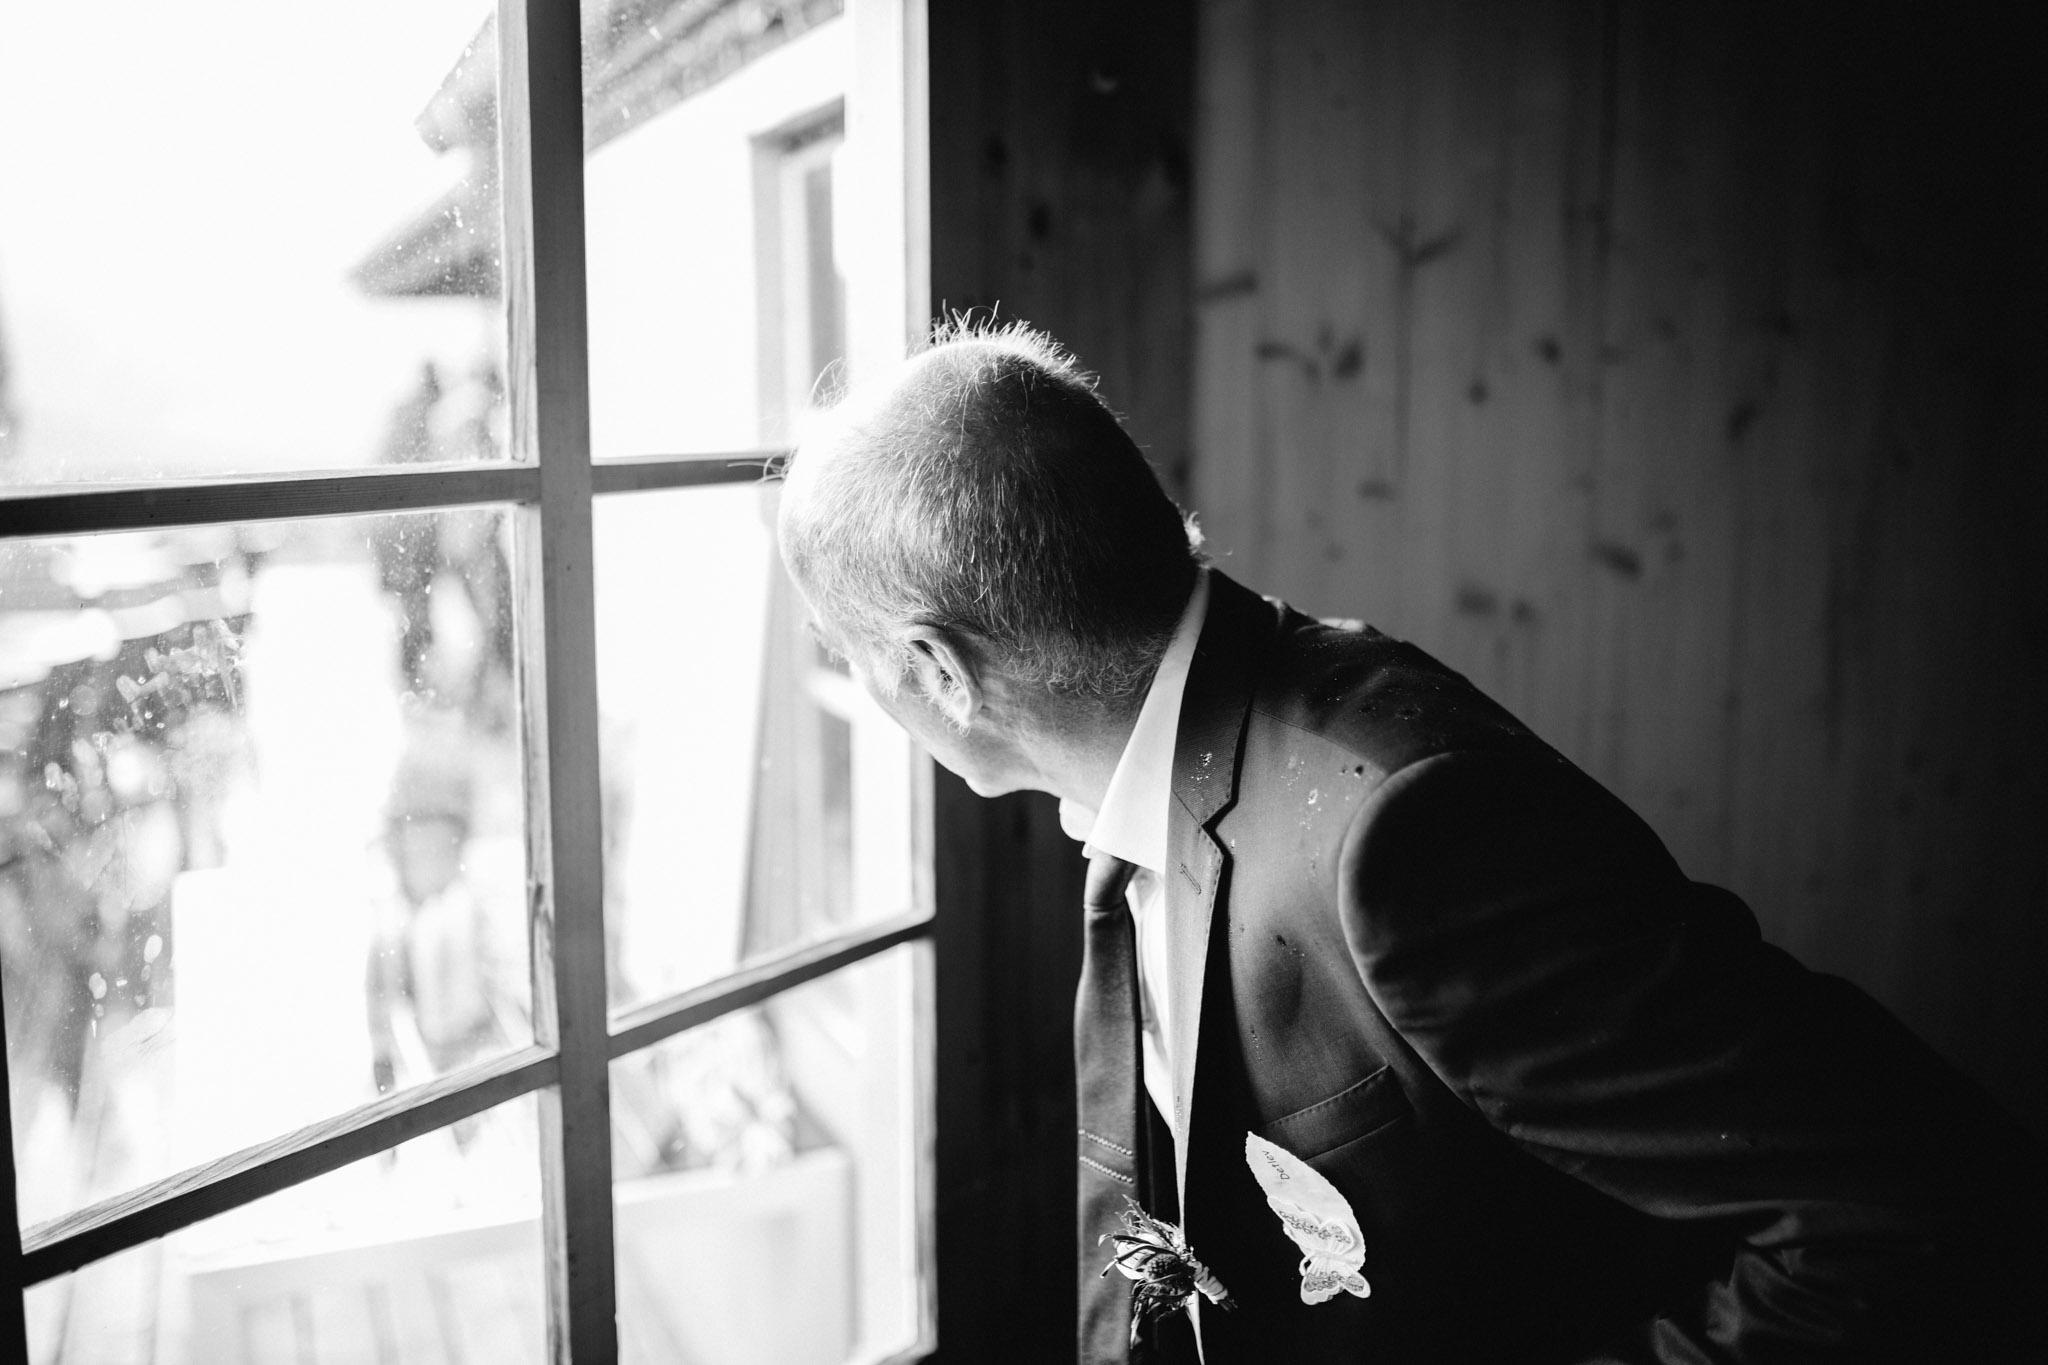 Lenl-Simmental-Buehlerhof-Pia-Anna-Christian-Wedding-Photography-EK-87.jpg